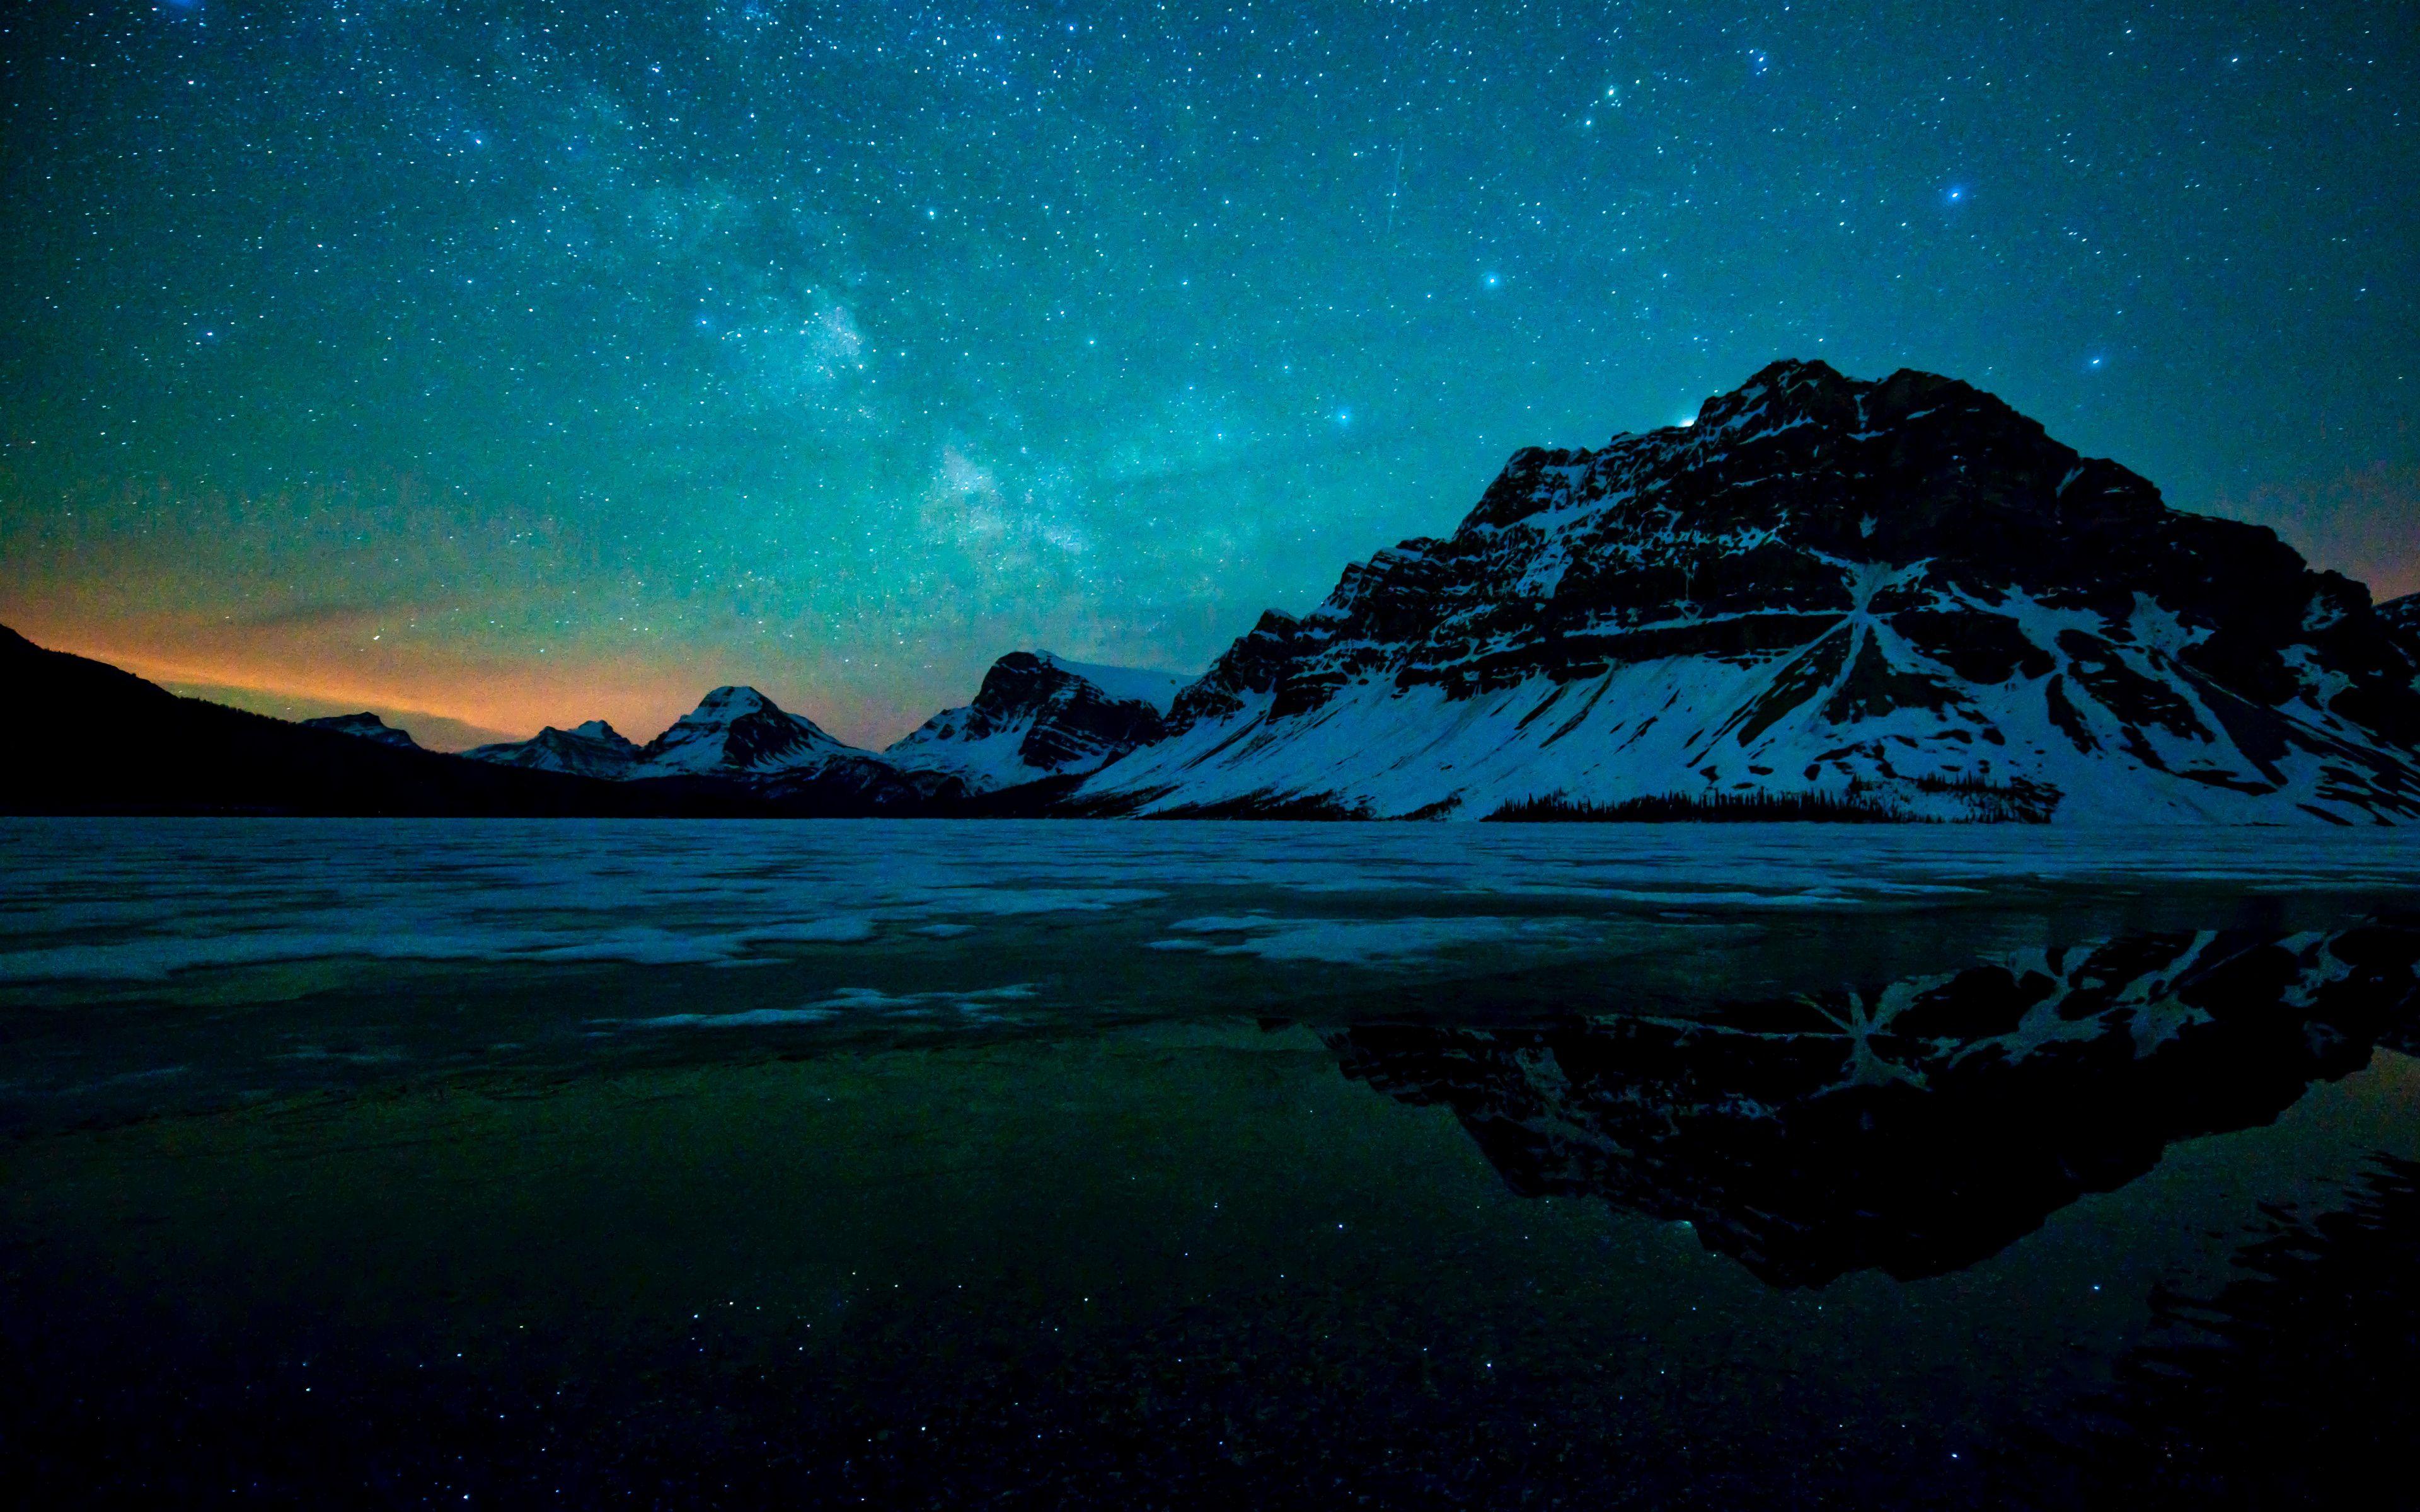 3840x2400 Milky Way Starry Sky Night Bow Lake Reflections Nature Wallpaper Night Sky Wallpaper Nature Wallpaper Mountain Wallpaper